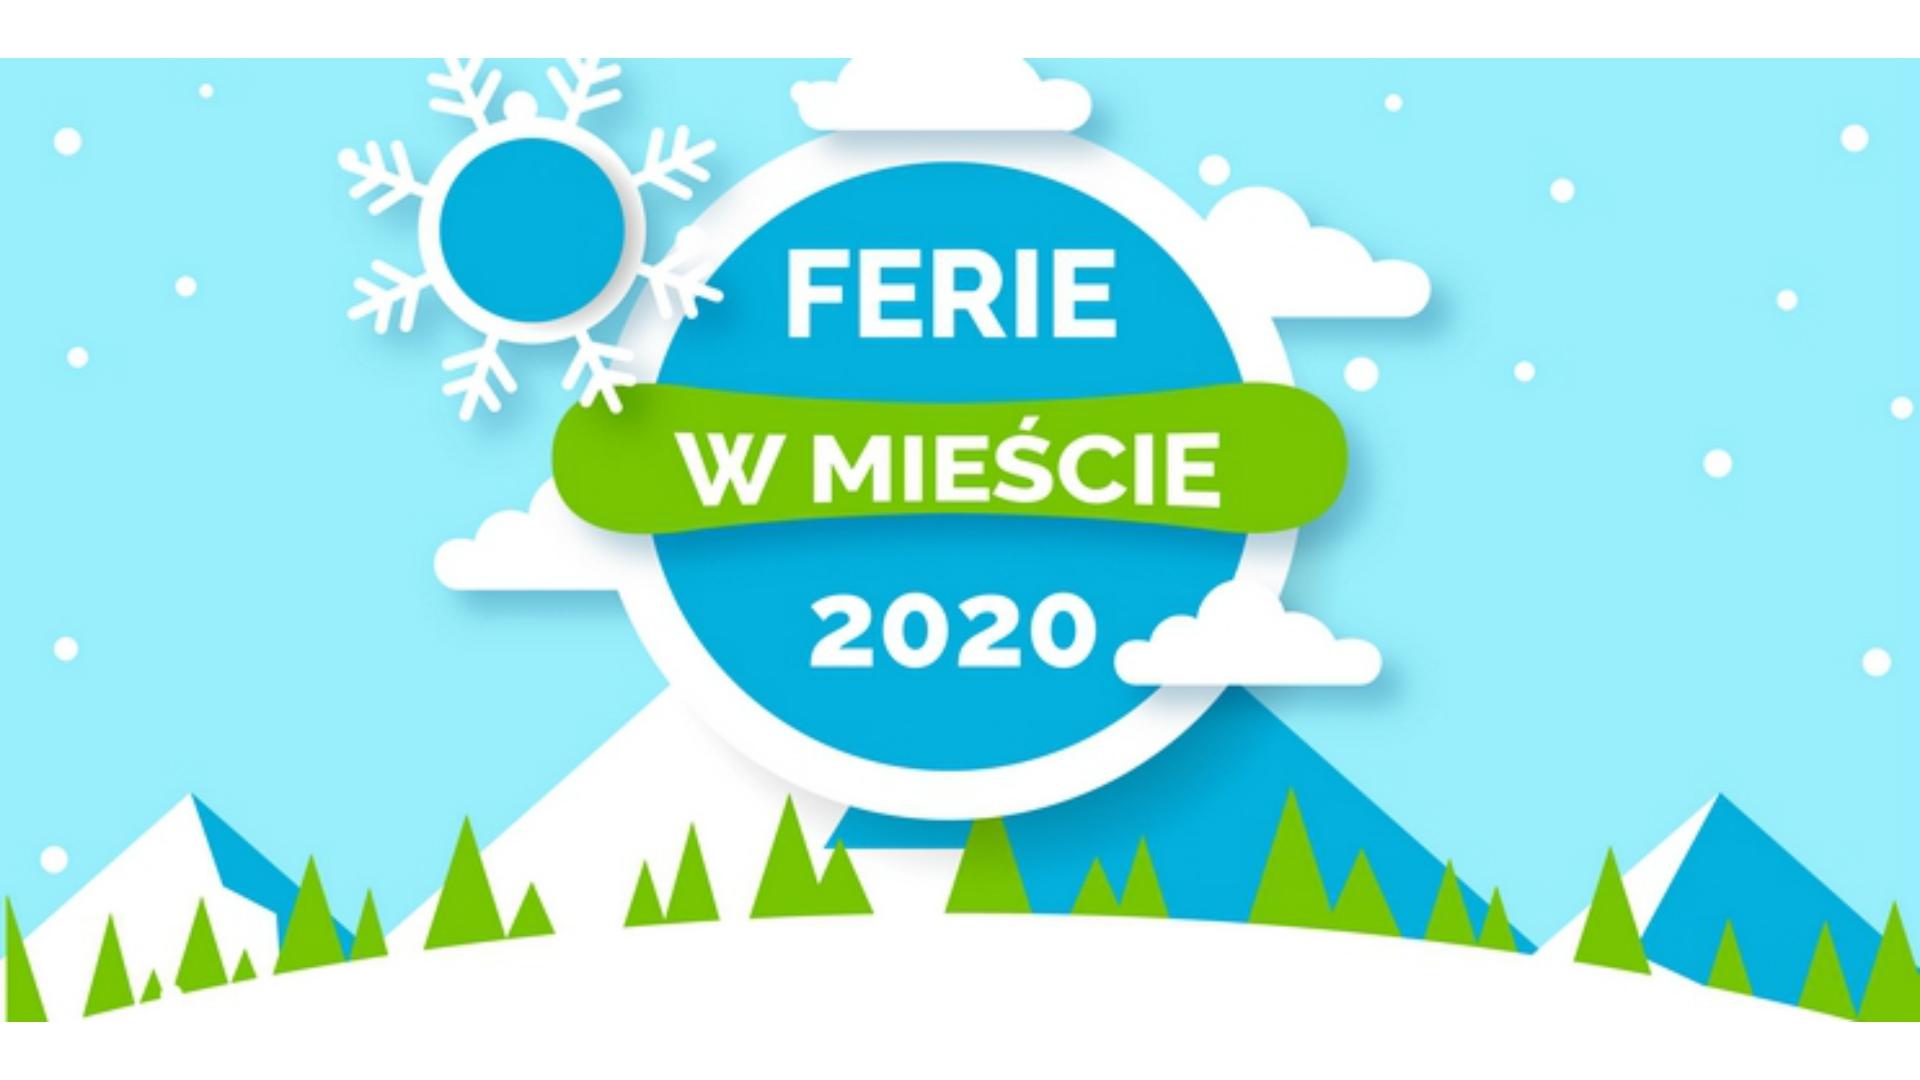 Ferie 2020 w Bochni